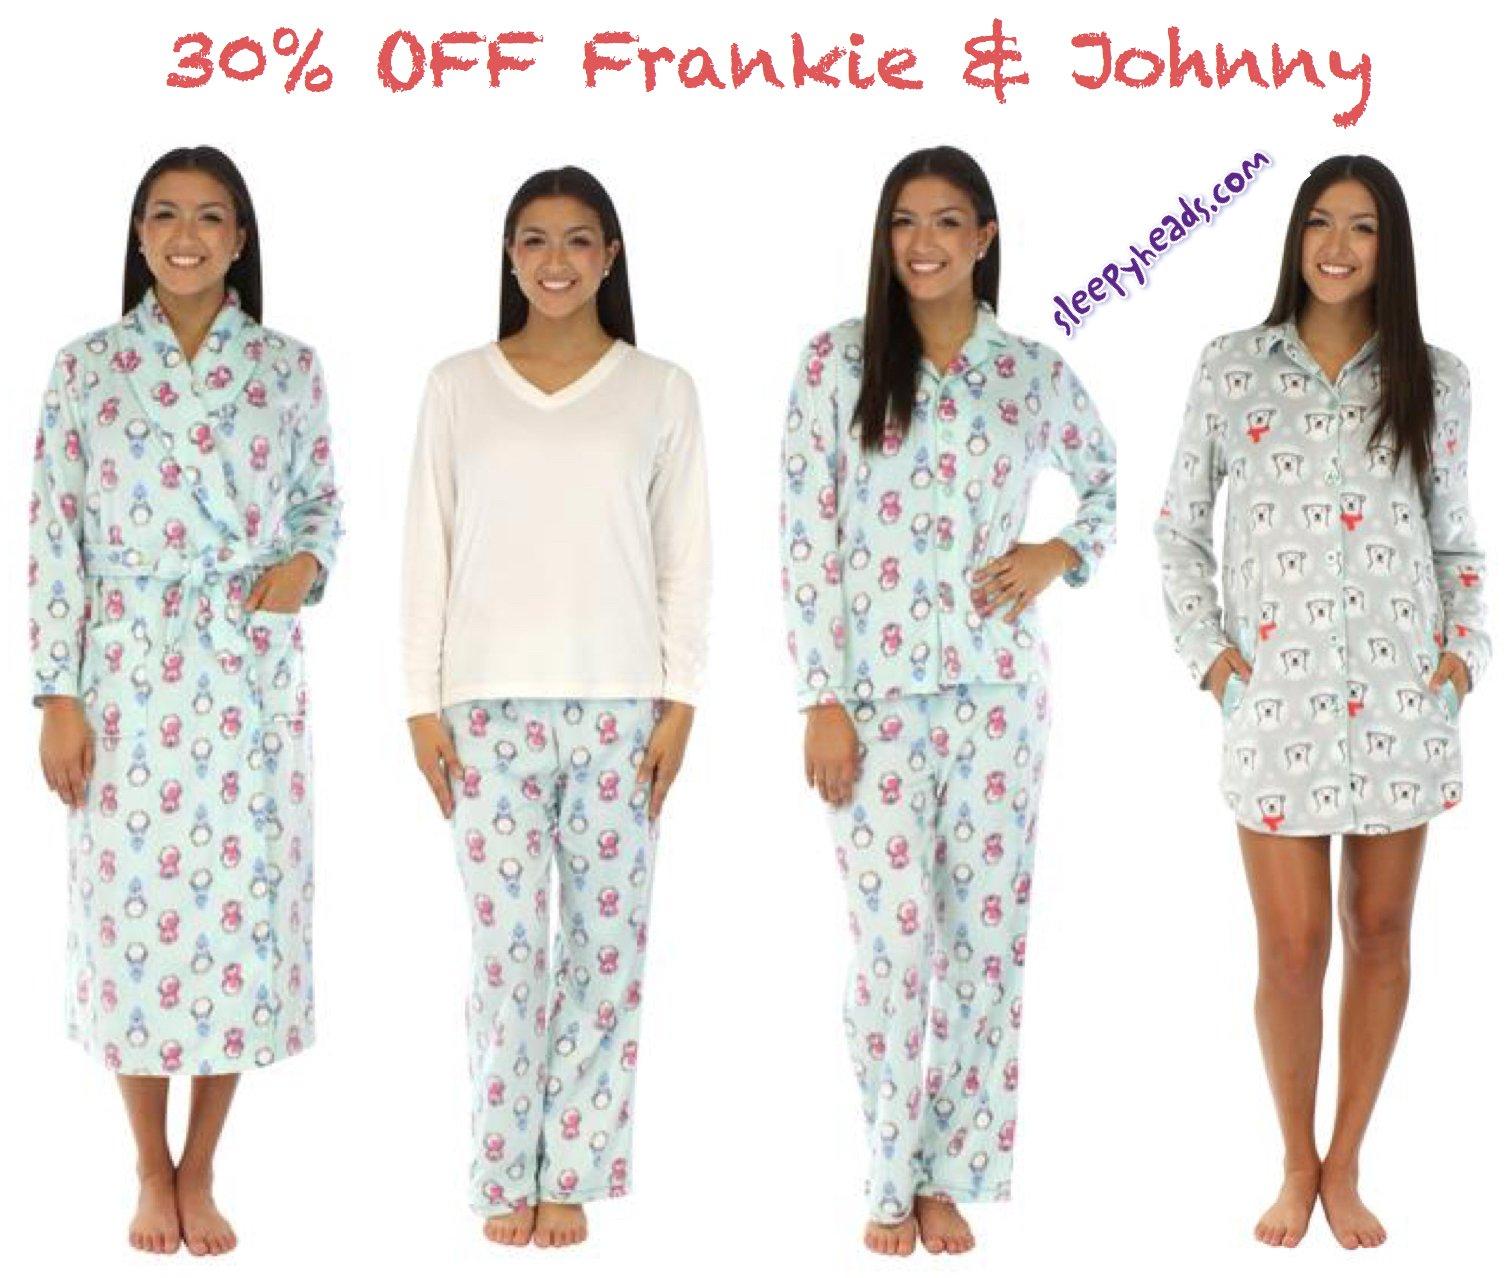 Frankie & Johnny Sale From Sleeypheads.com